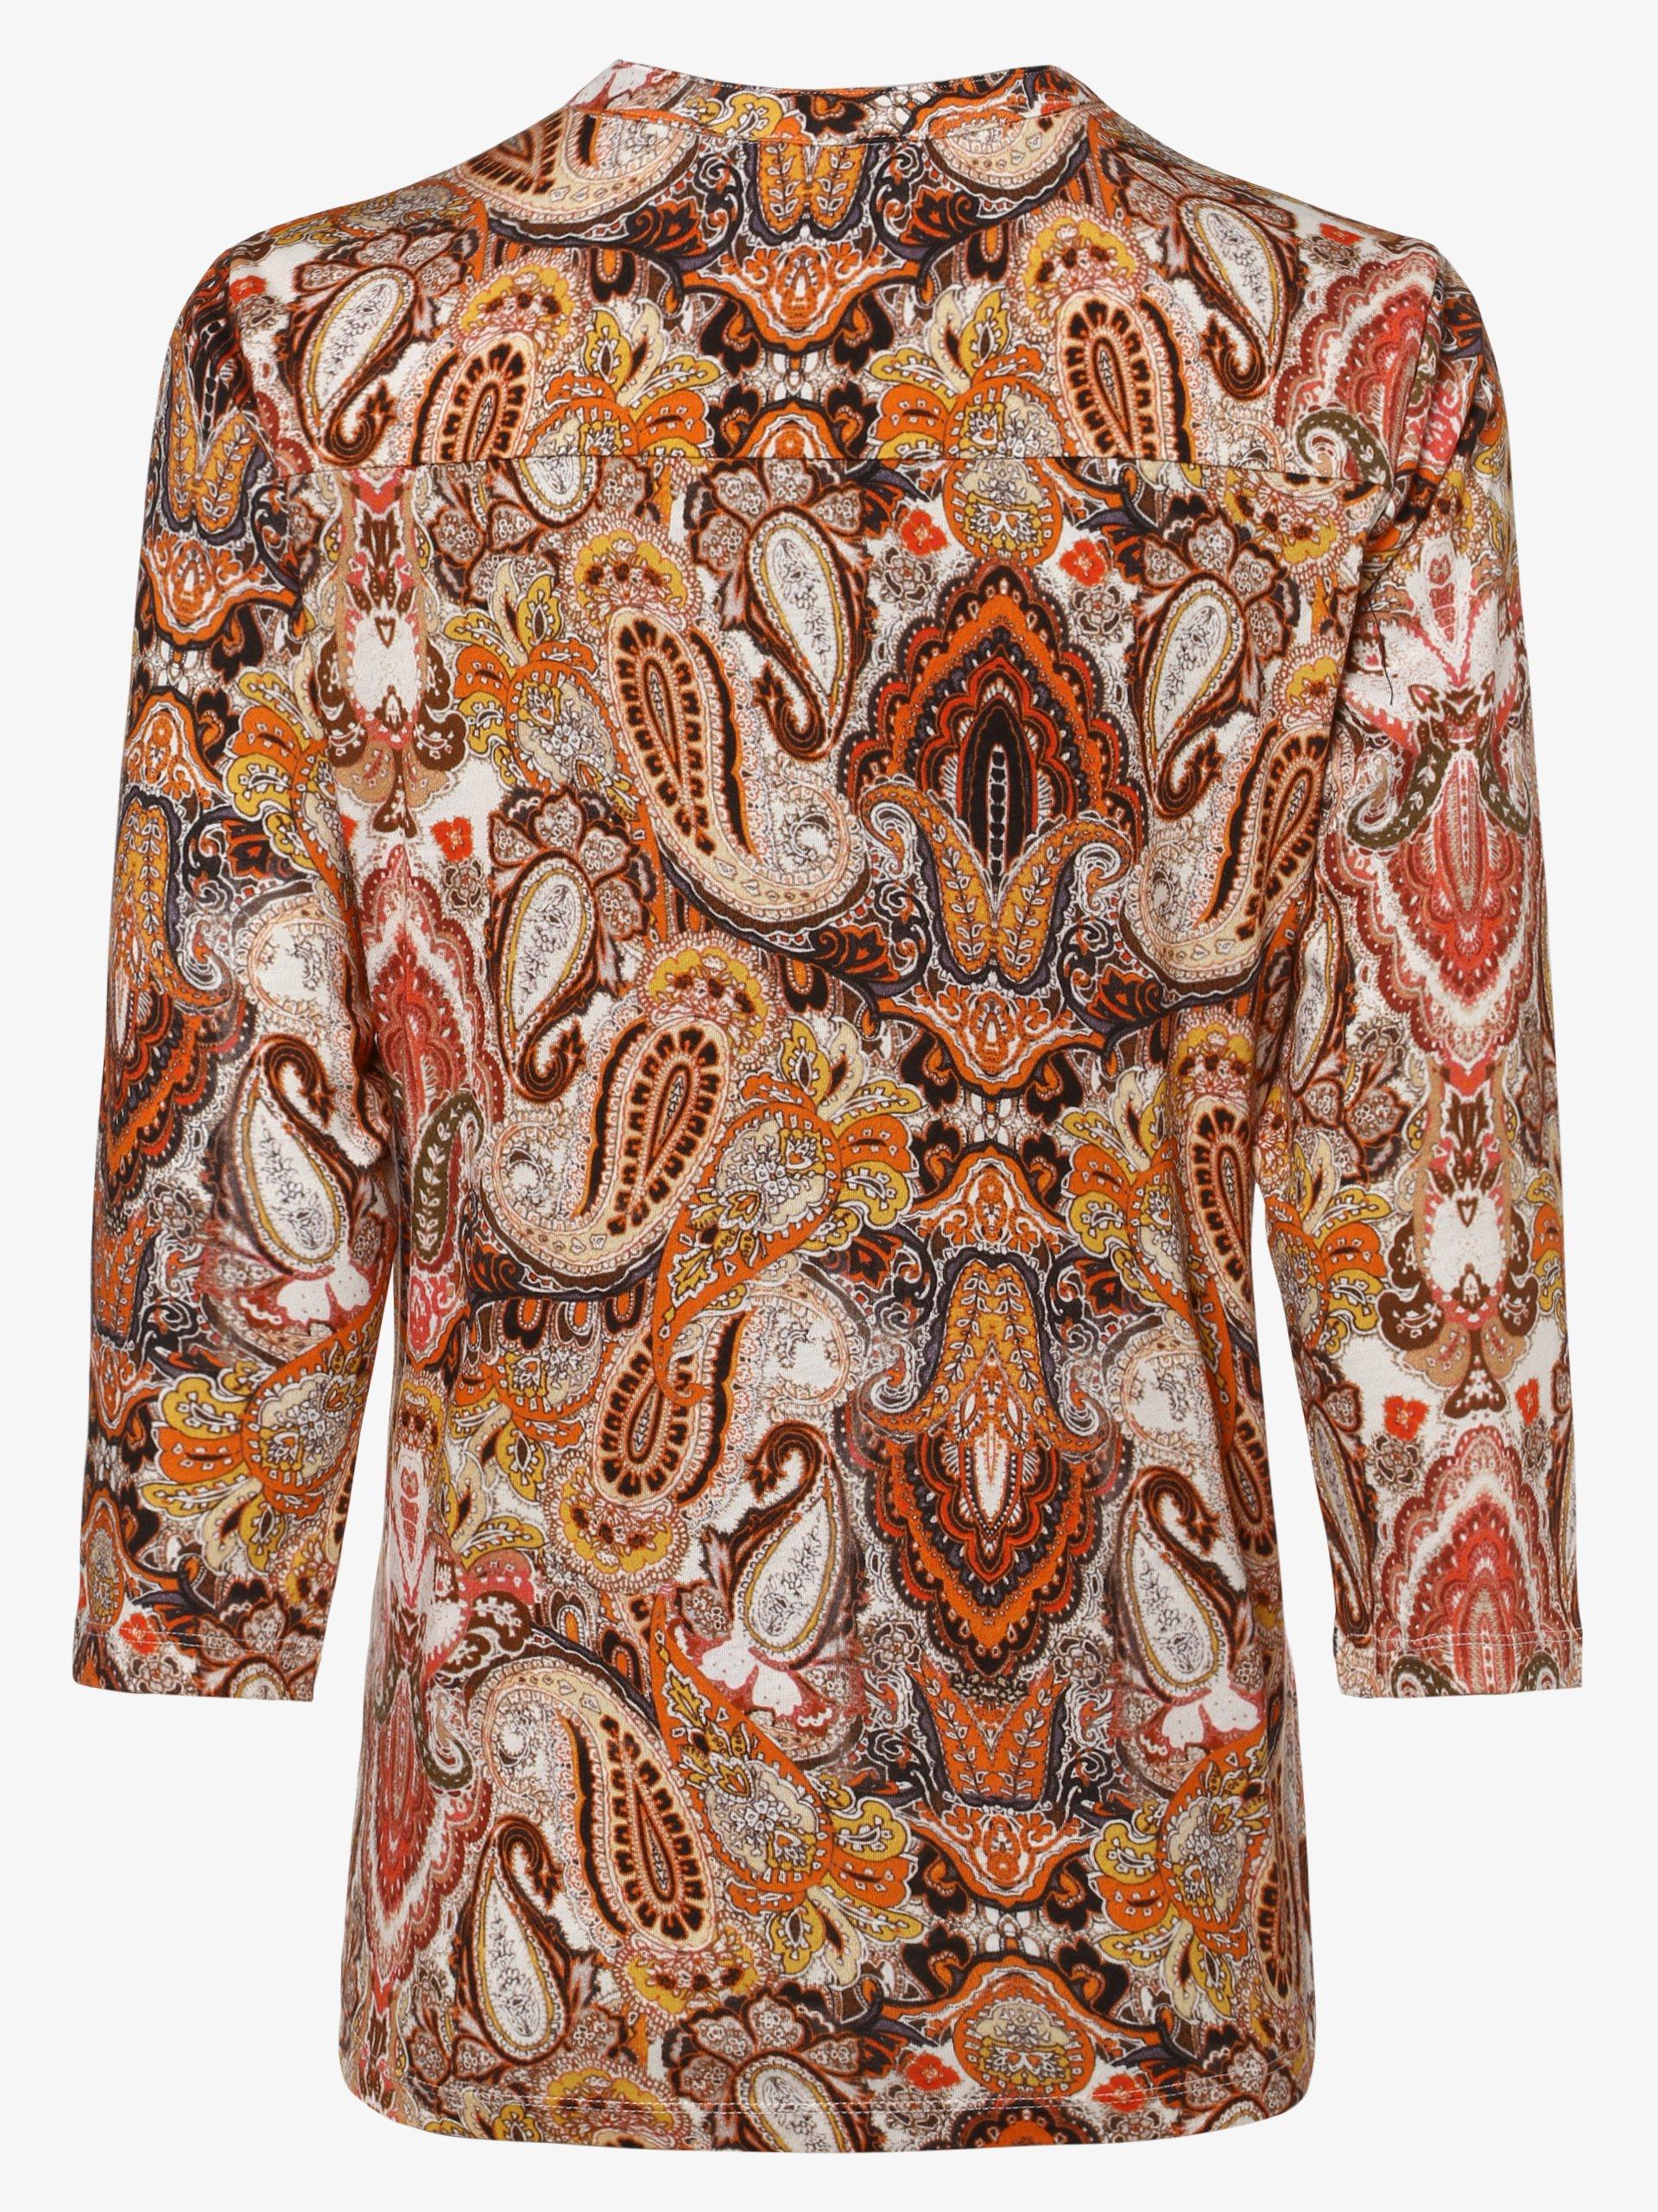 Franco Callegari Damen Shirt